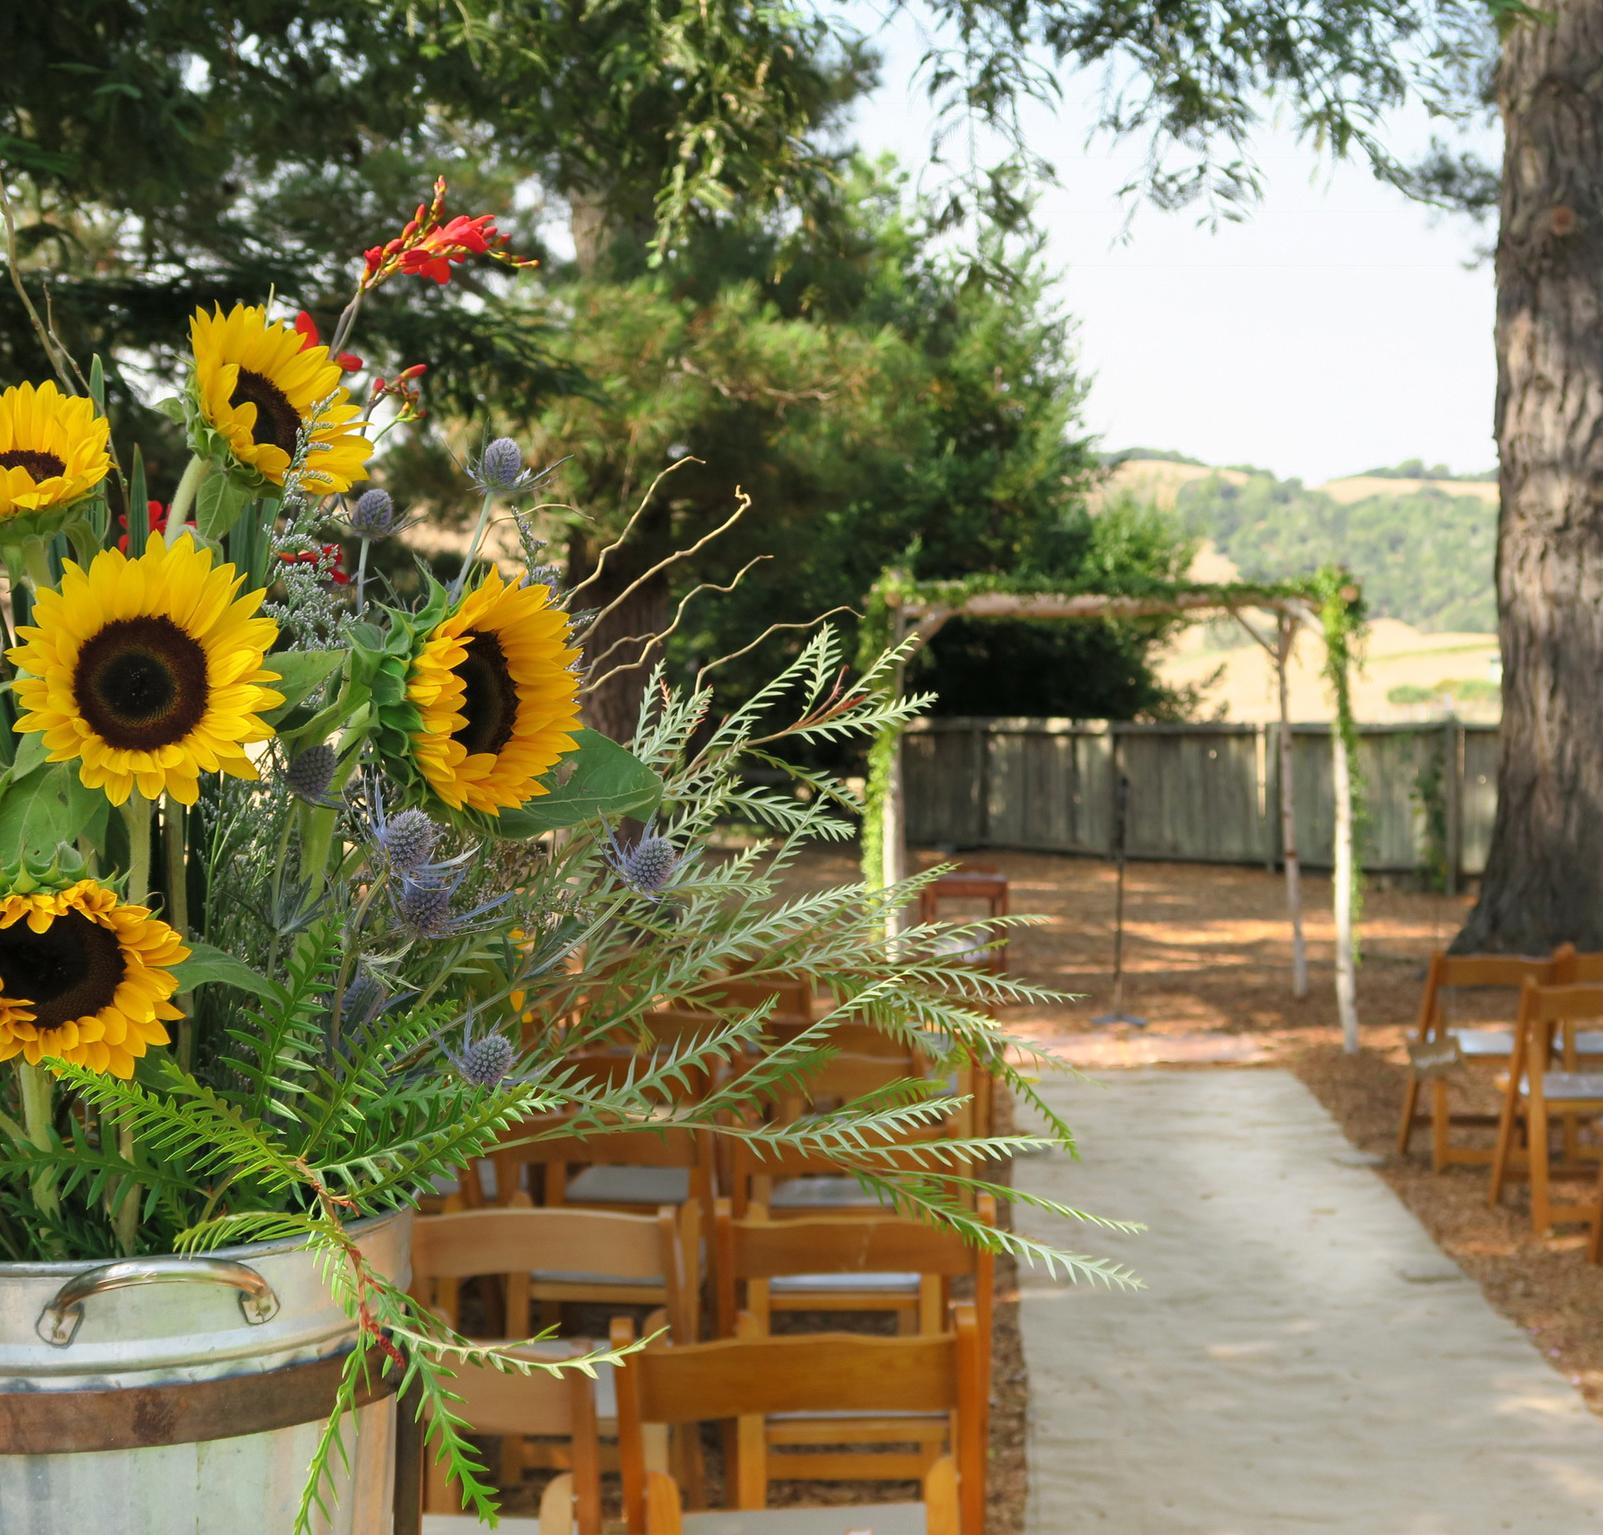 Weddings Receptions Outdoor Venue Catering Services Restaurant